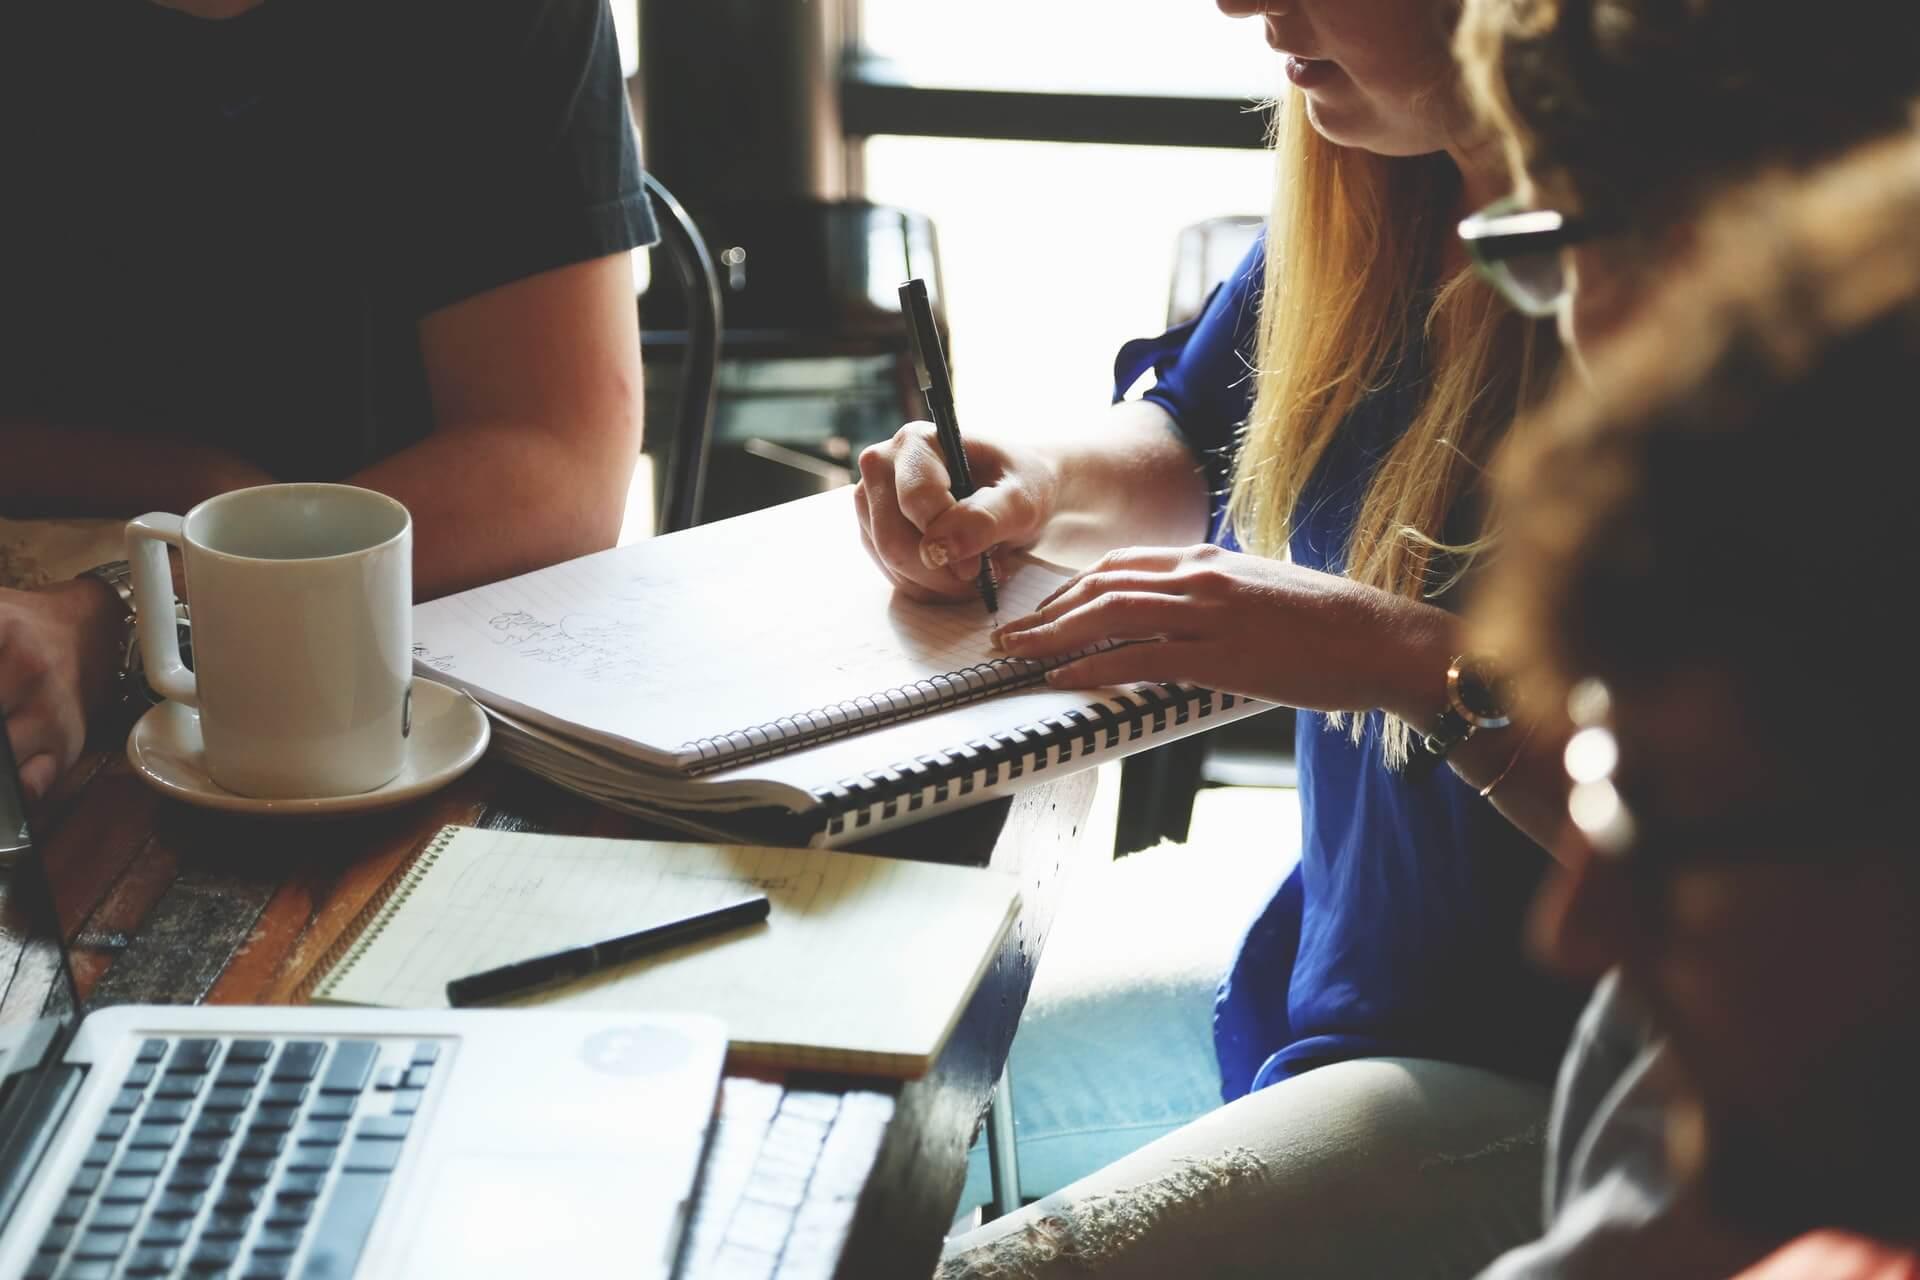 Medical School Essay Help - Residency statement guide - EssayEdge